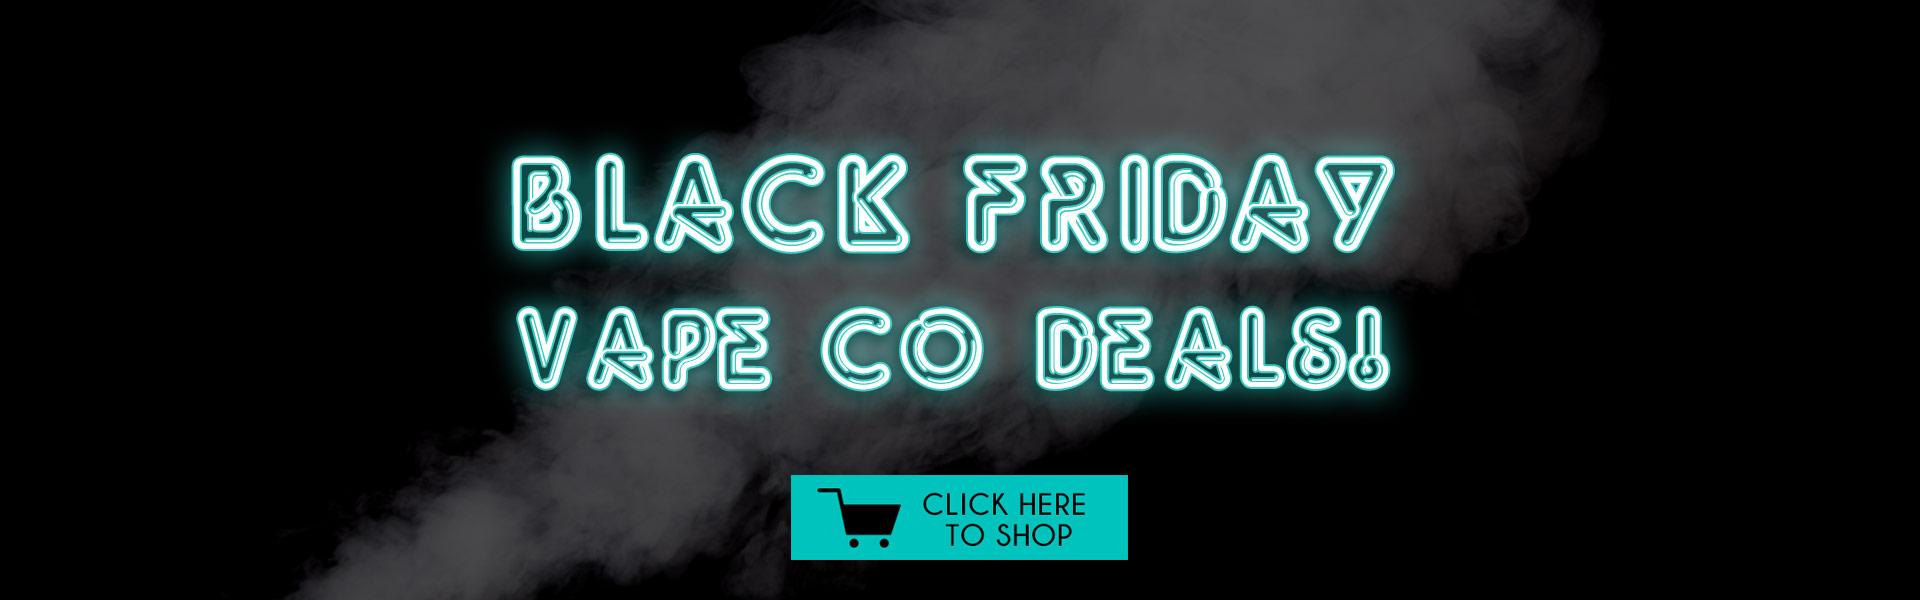 Blackfriday Deals